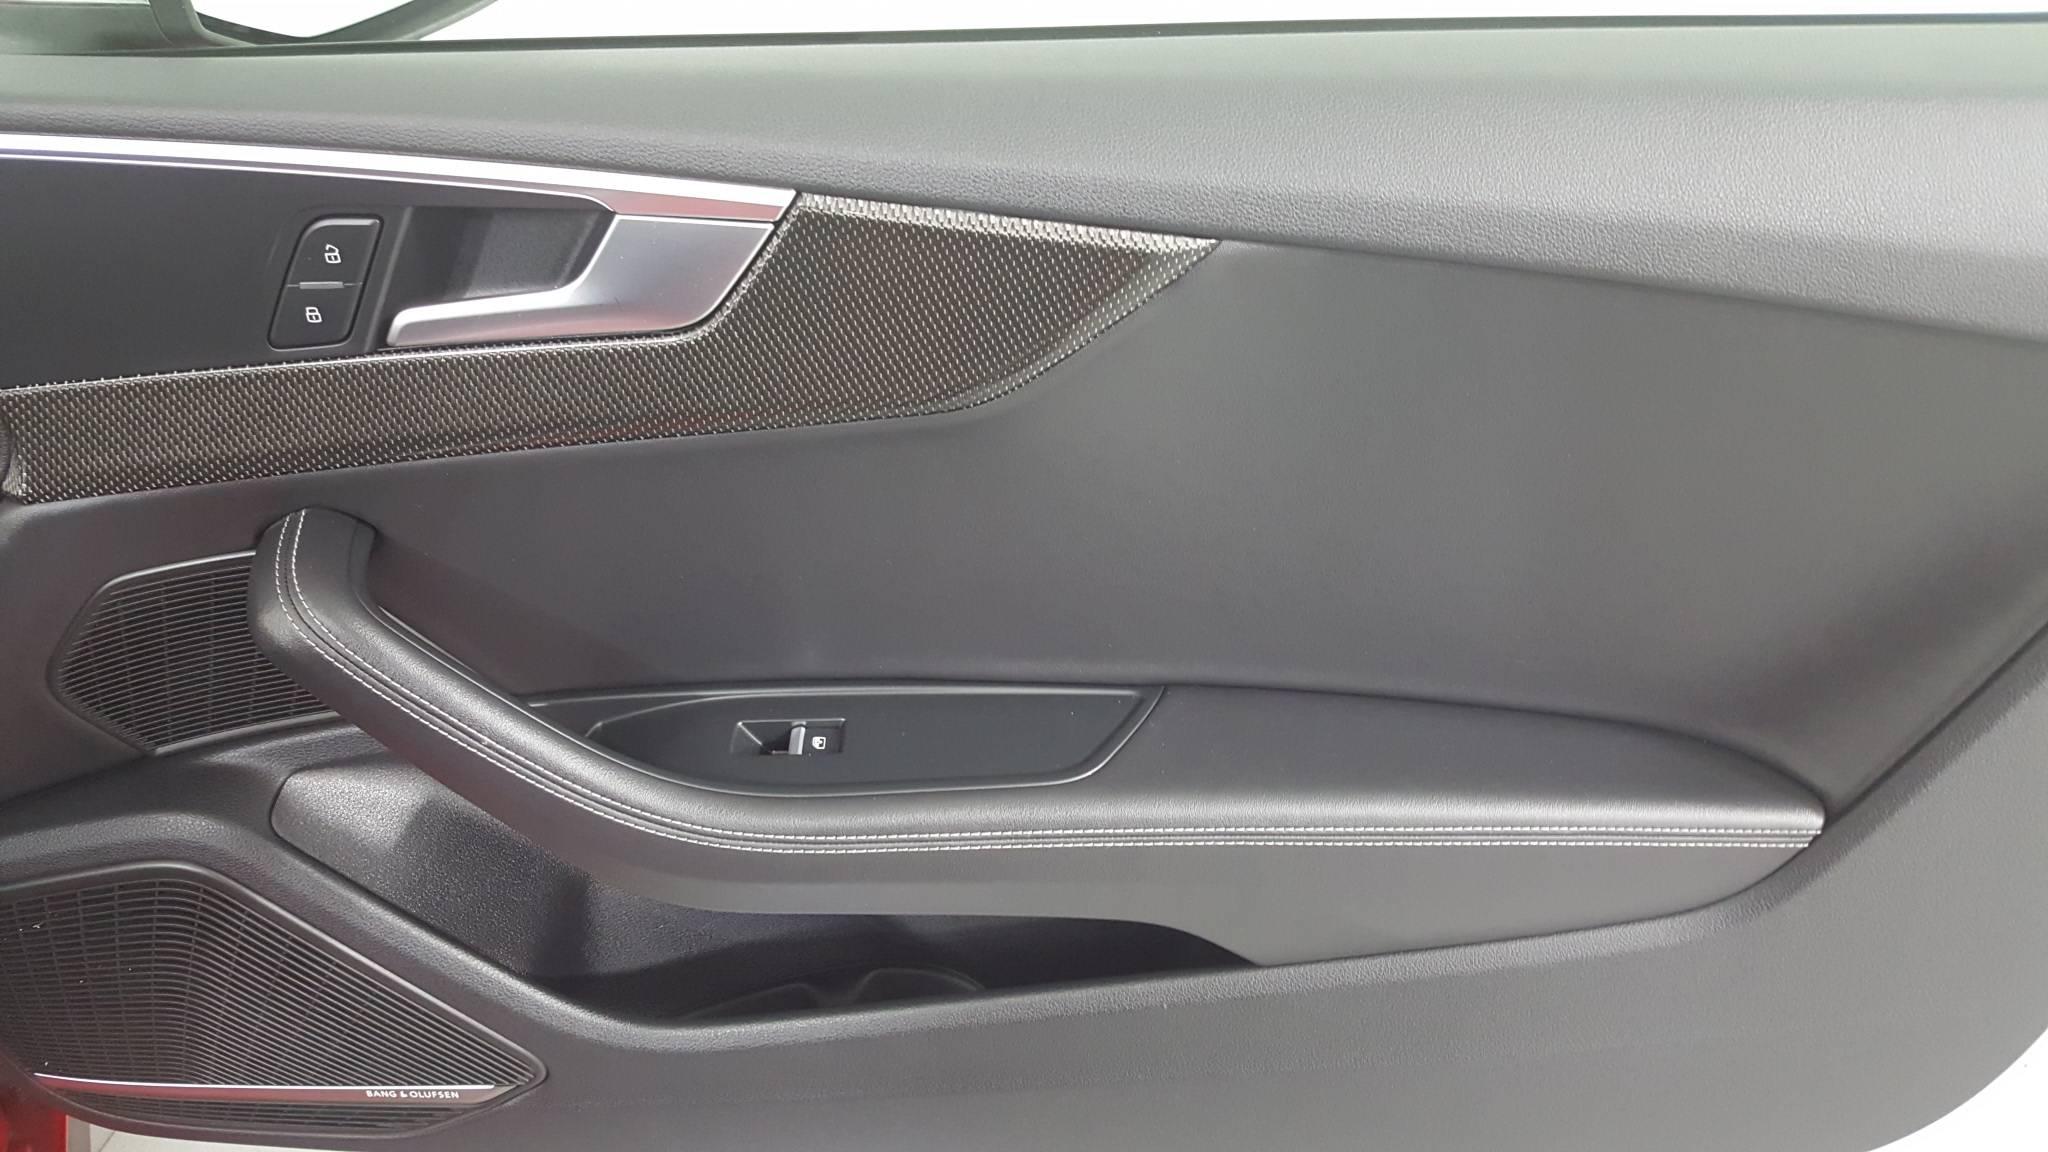 Certified Pre-Owned 2018 Audi S5 Cabriolet Prestige